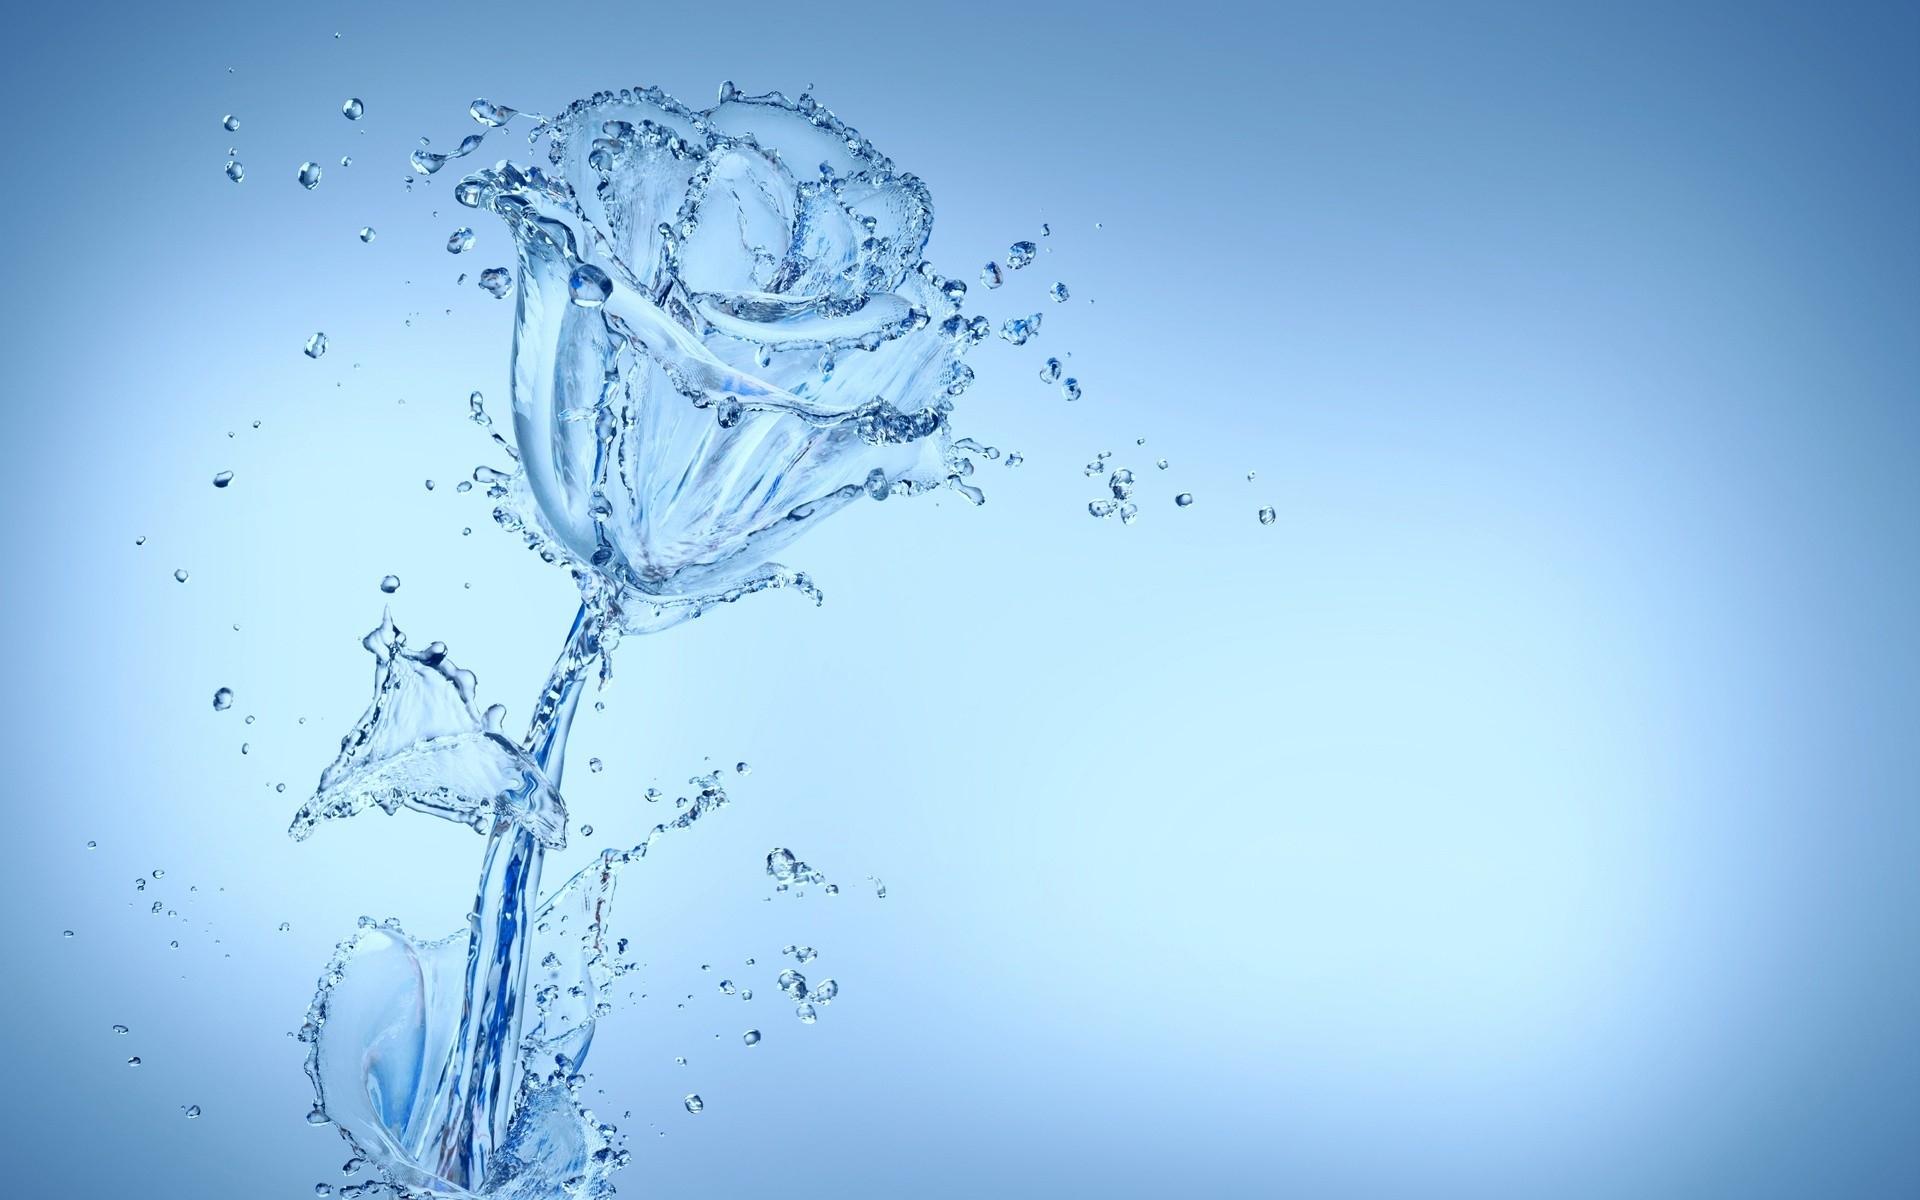 Cool Water Flower Wallpaper 37544 1920x1200 Px